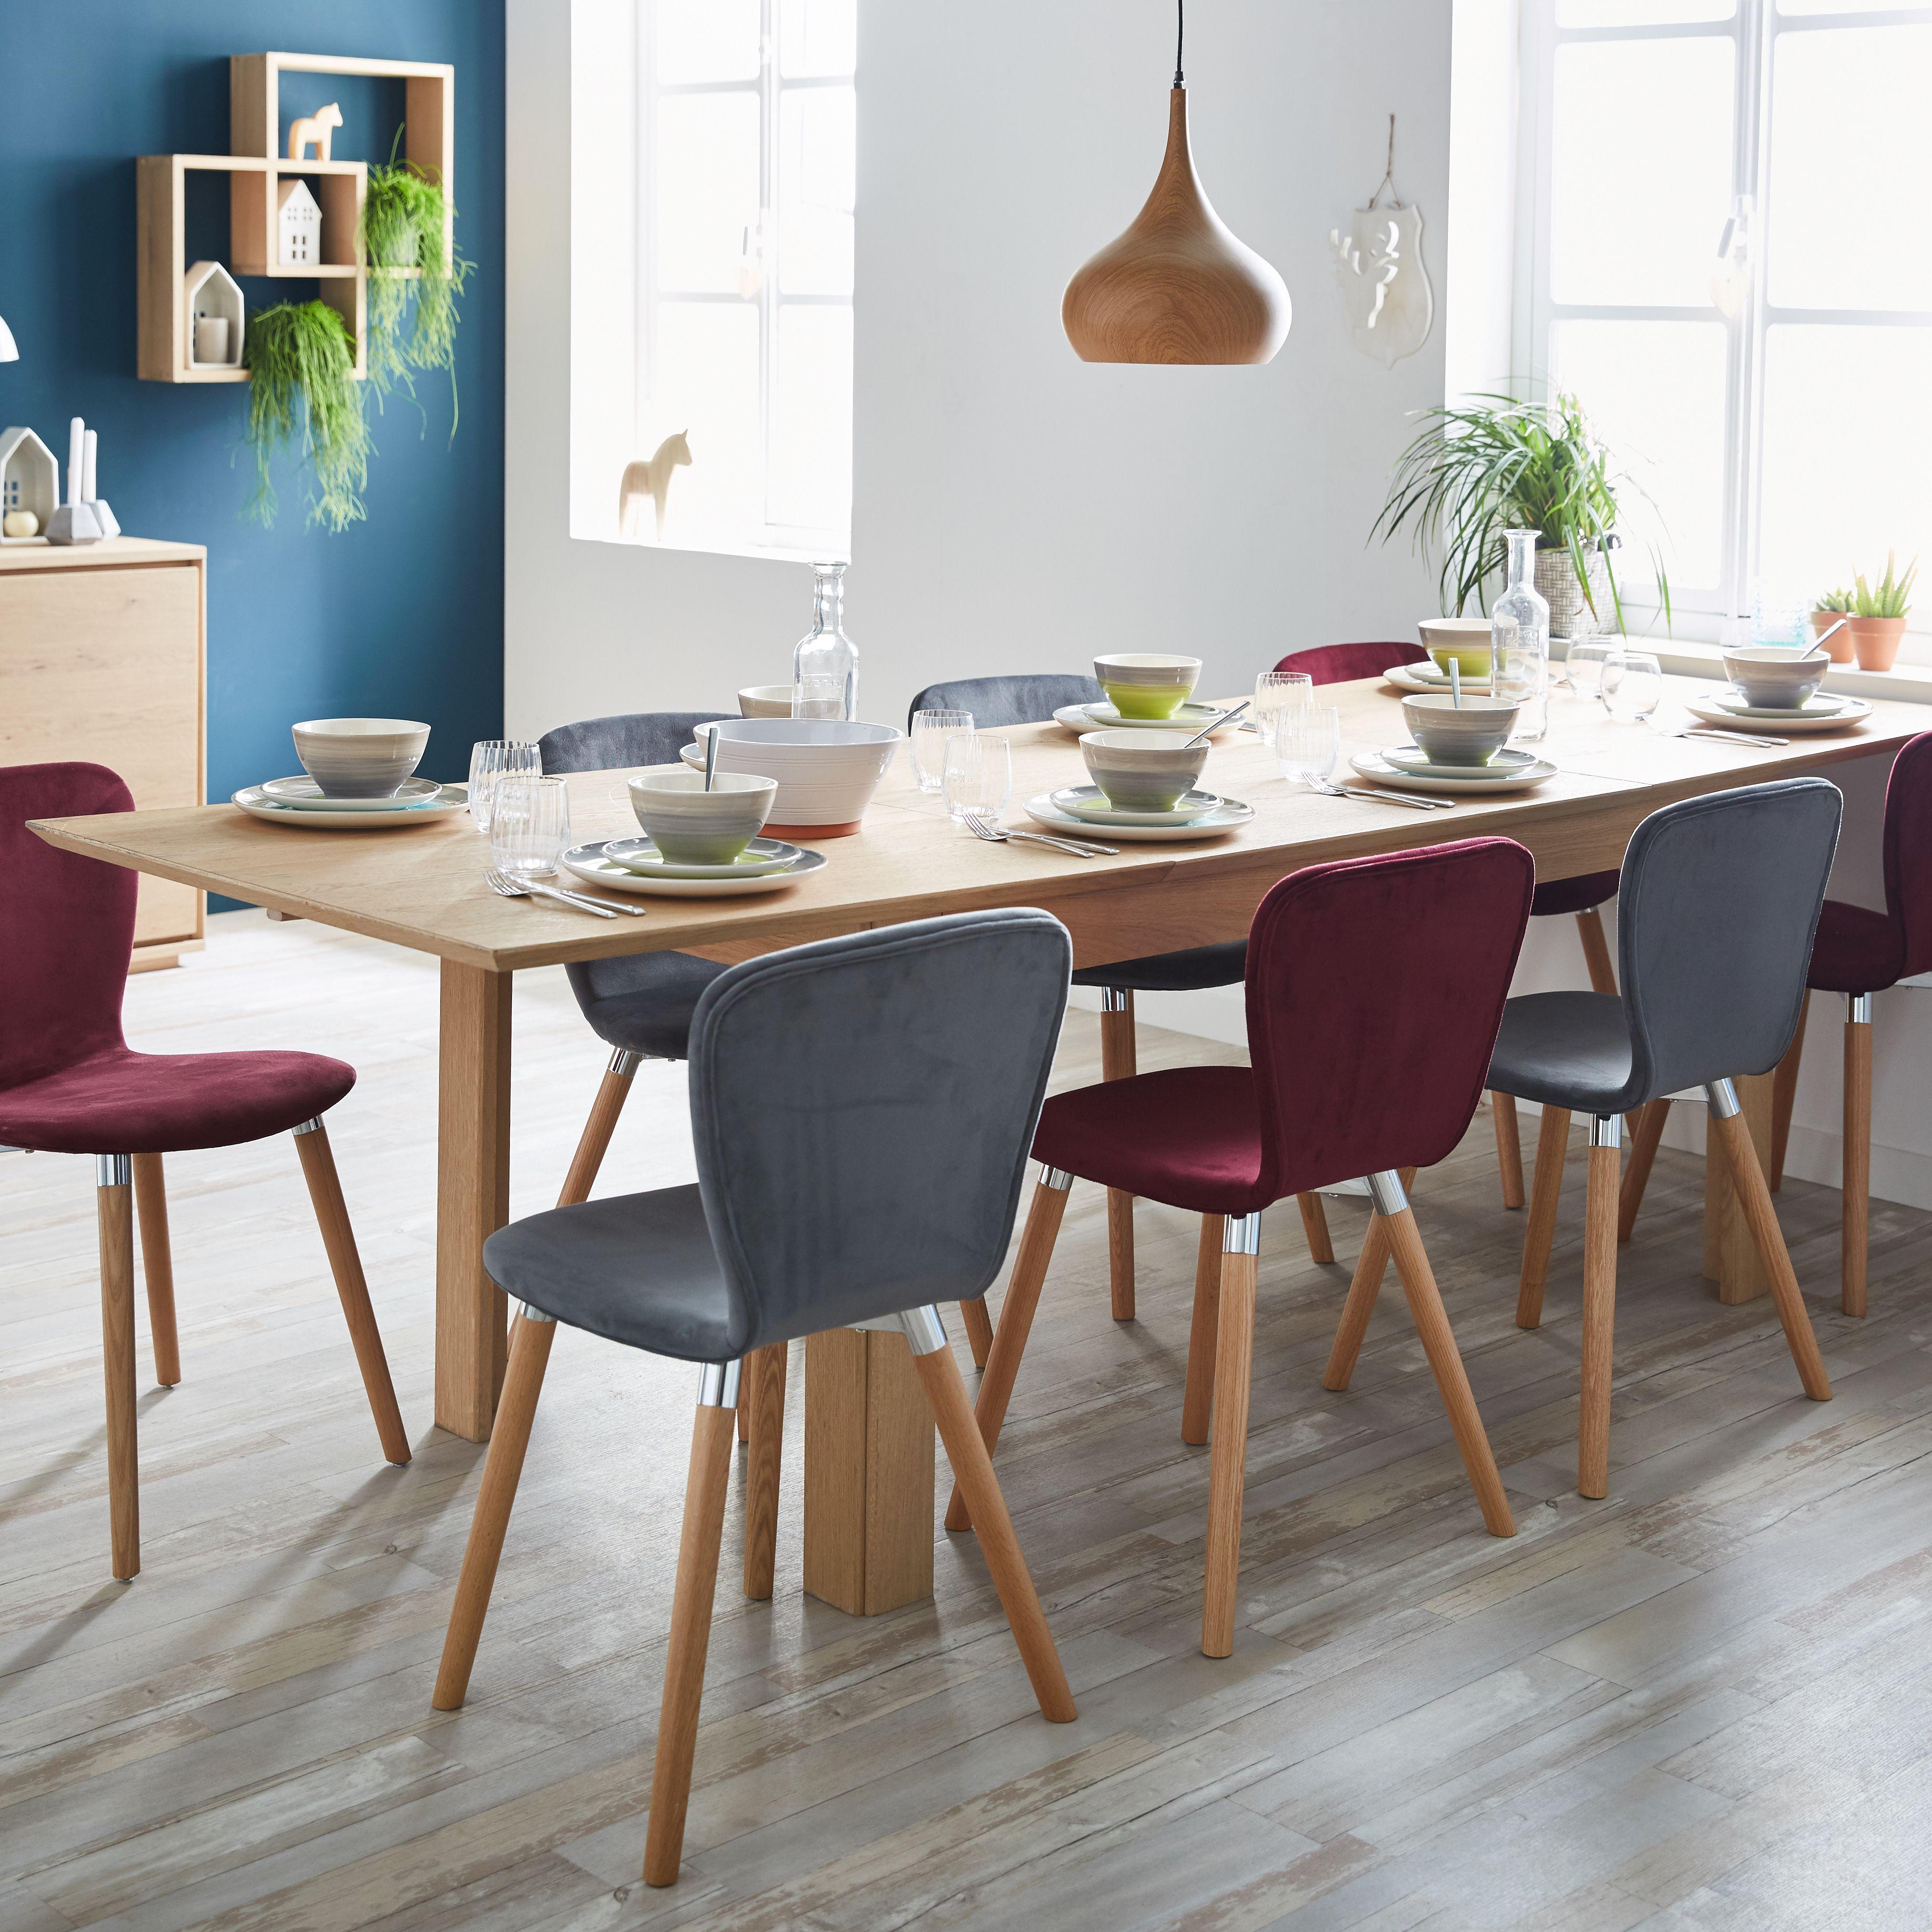 daphne chaise design scandinave bleu